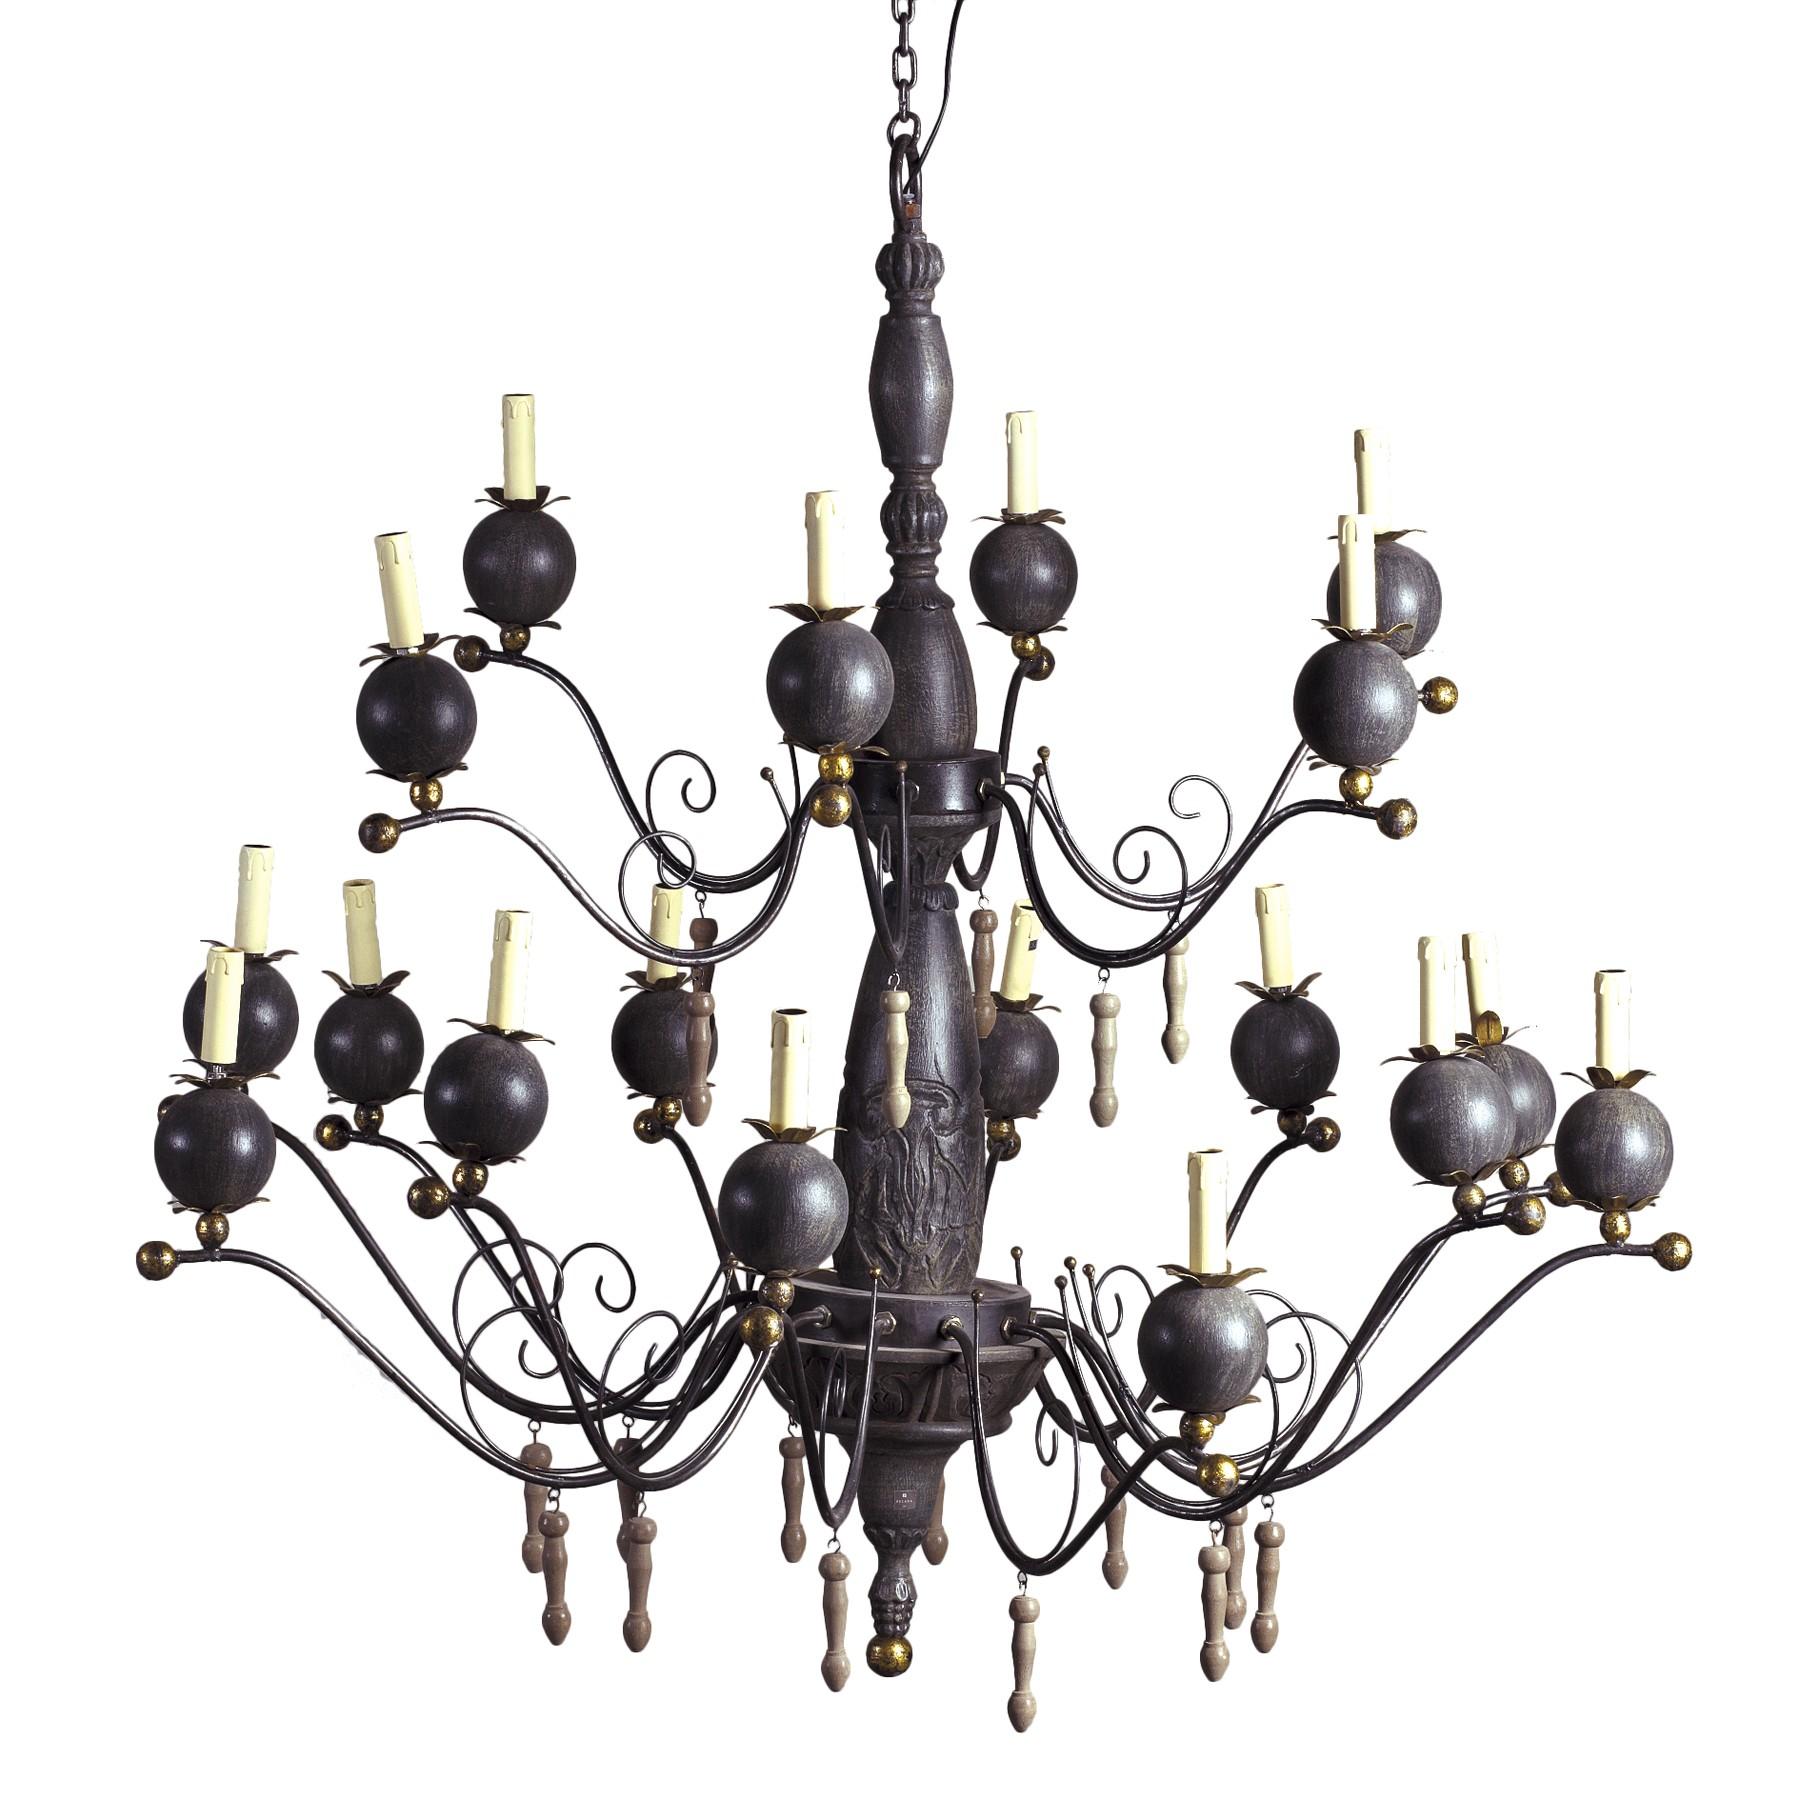 competitive price f6785 f3560 18 light pomegrates chandelier - Becara Tienda online